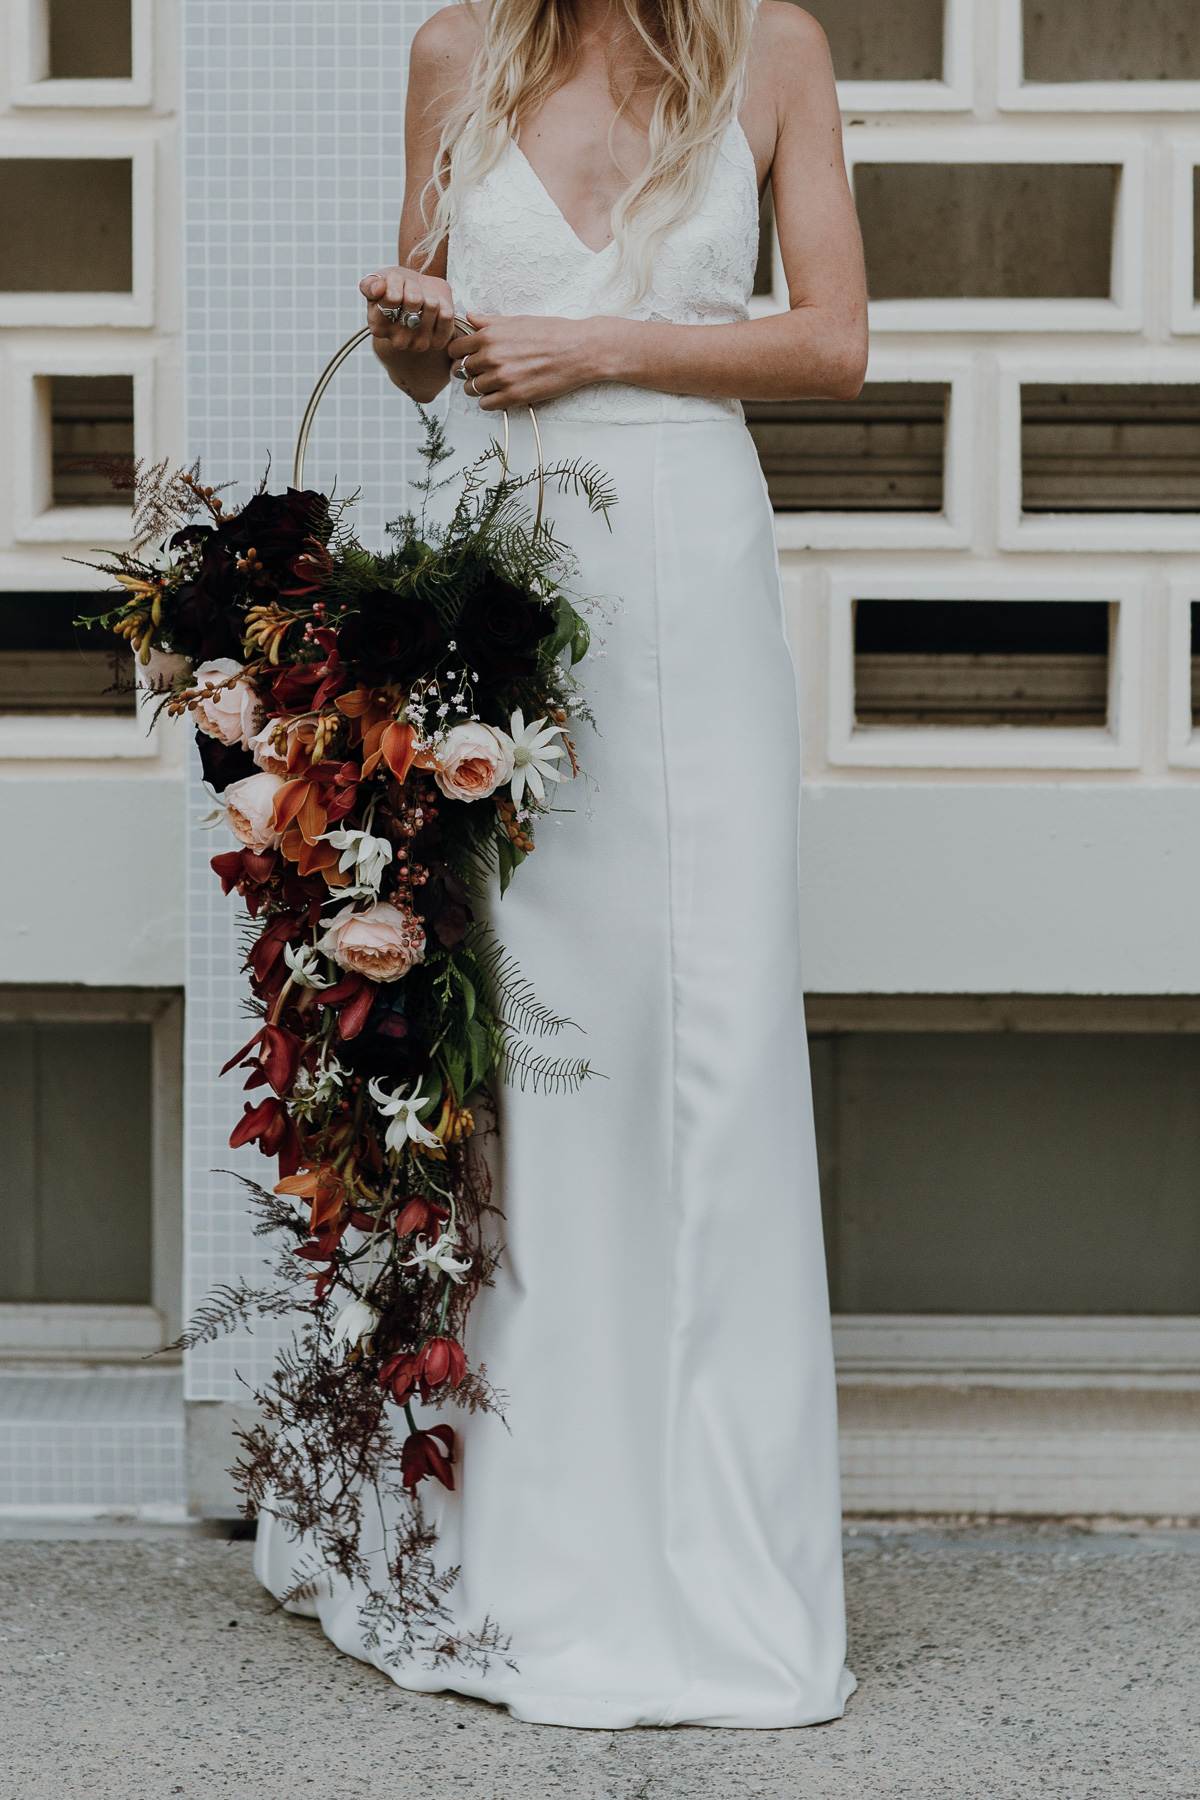 The Bloom Romantic-Peggy Saas Perth Wedding Photographer-Same Sex Wedding-61.jpg